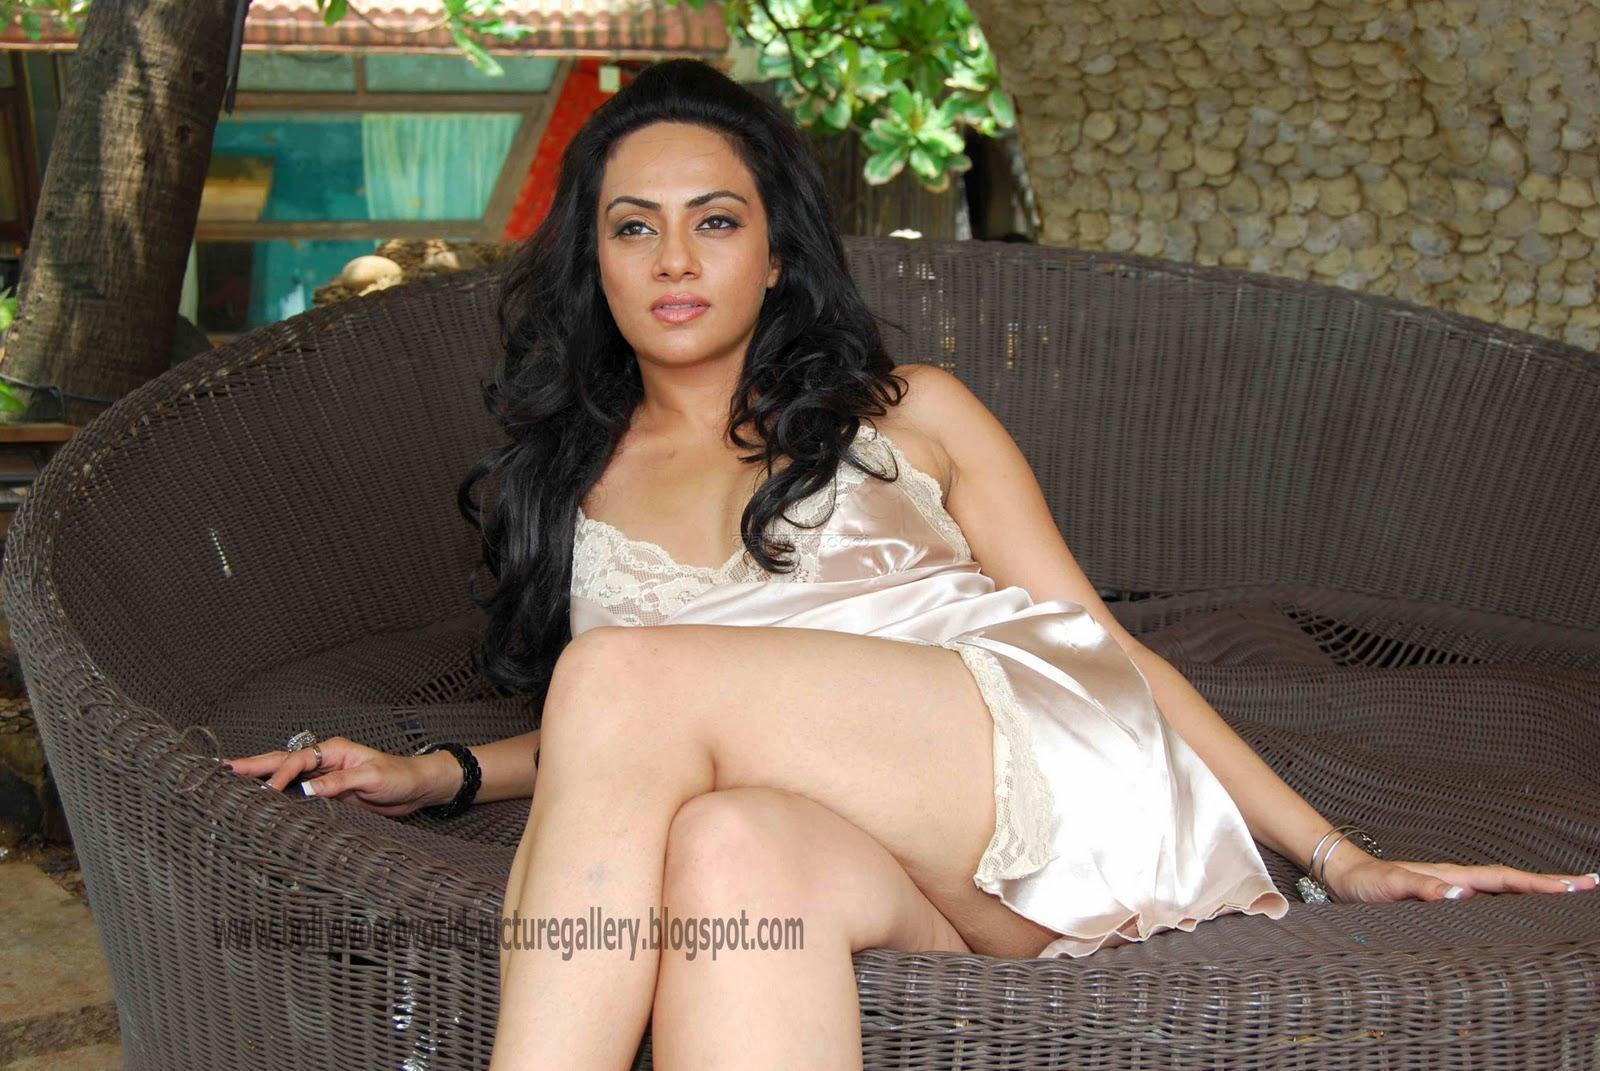 Ass Of Bollywood 100